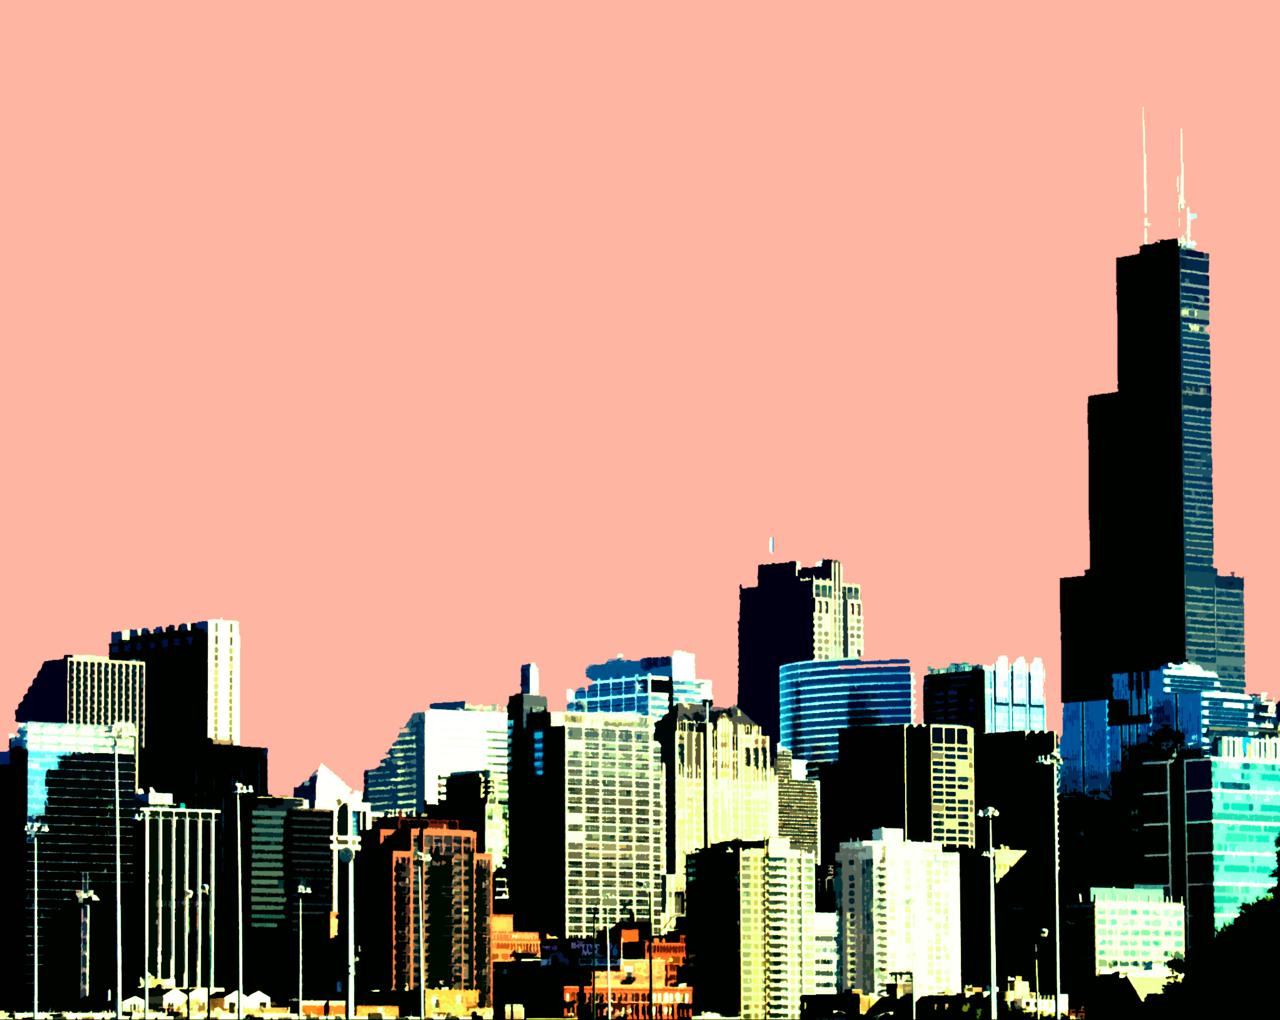 chicago skyline art - photo #30